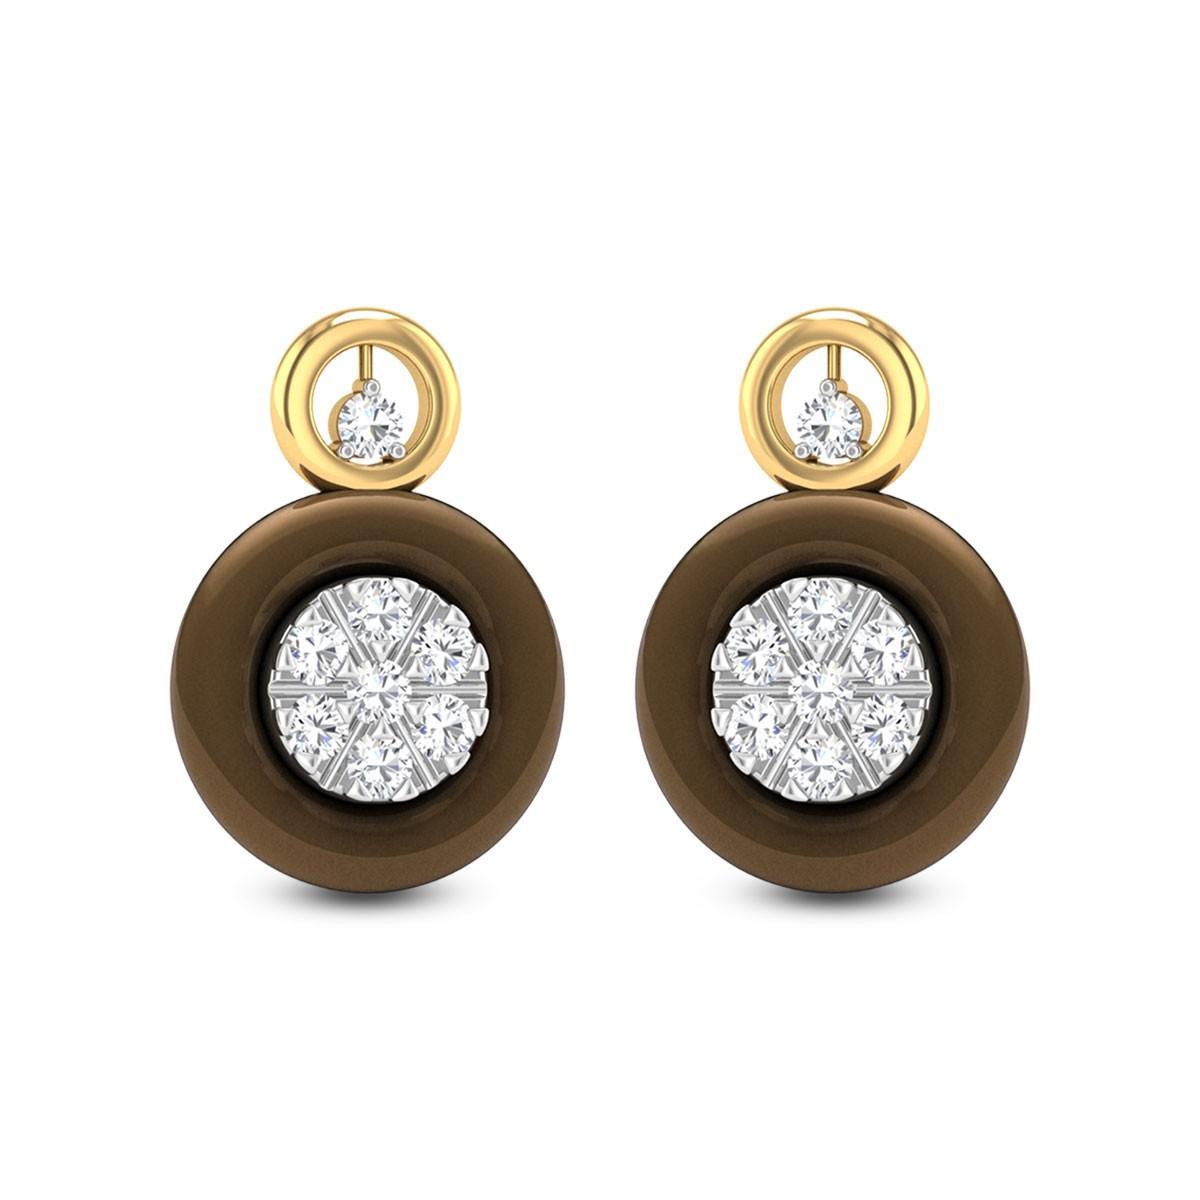 Luvey Diamond Earrings